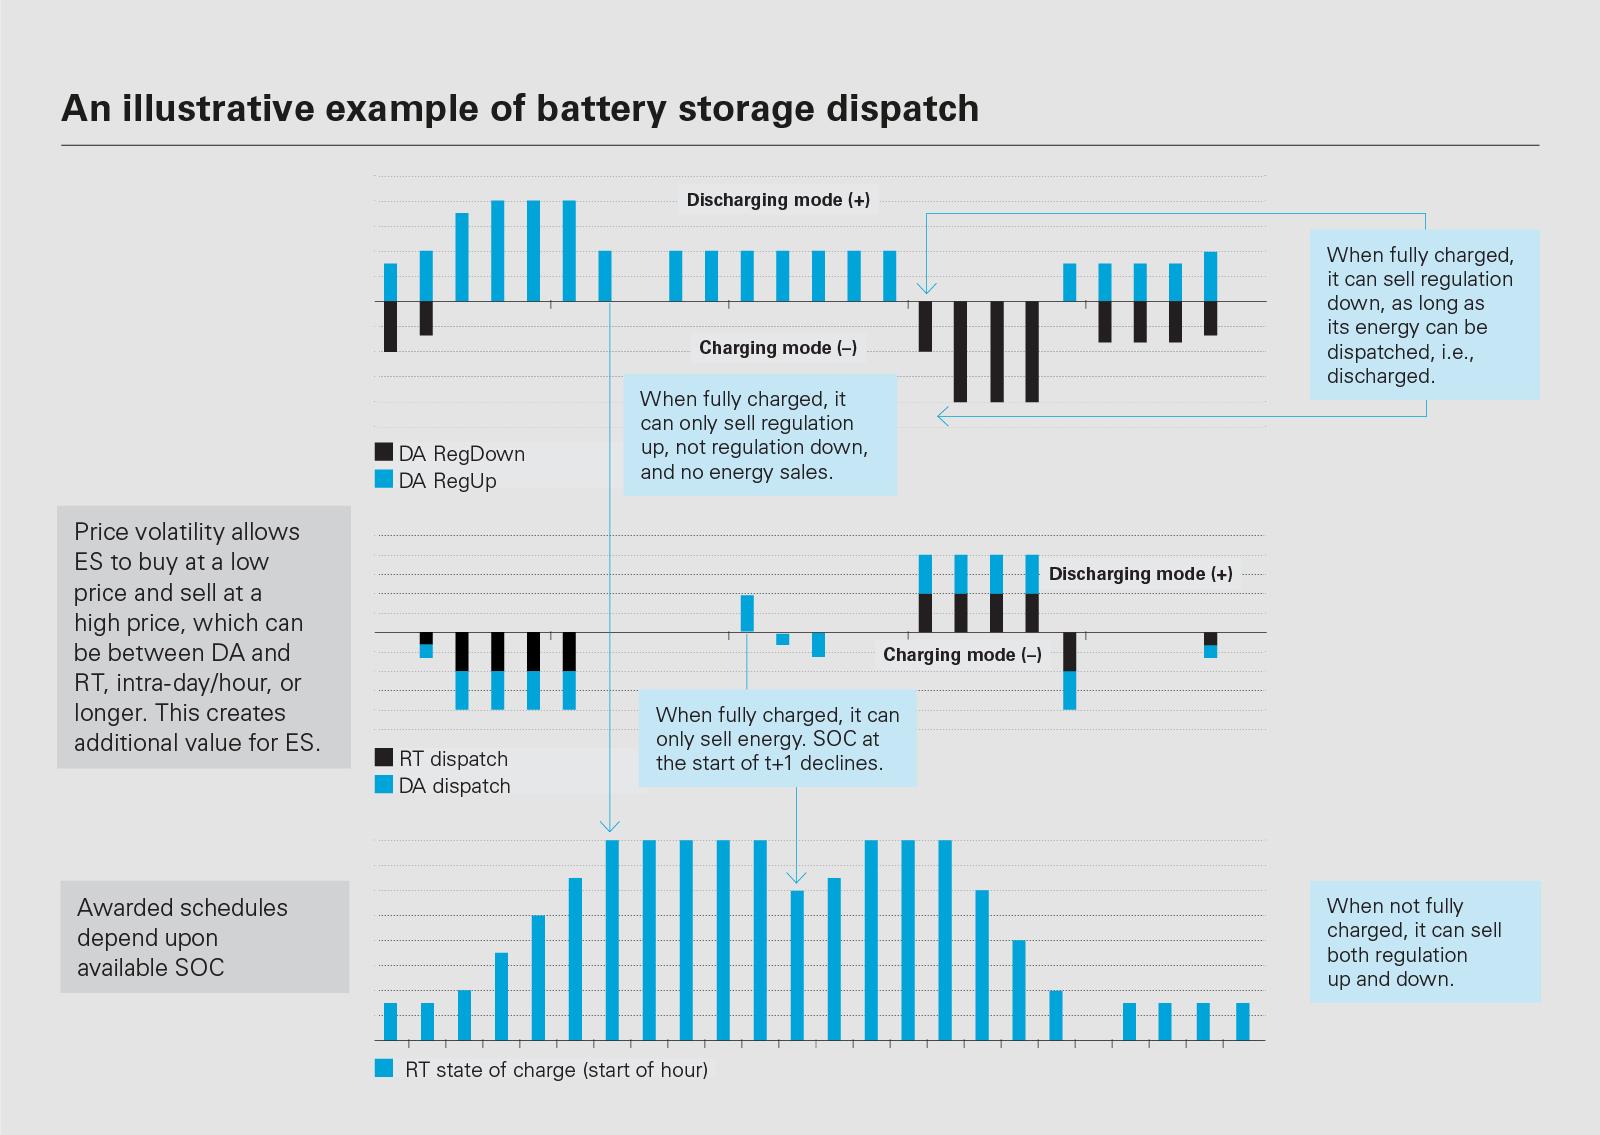 Energy_storage_LON0319065_Chart8_1600x900.png